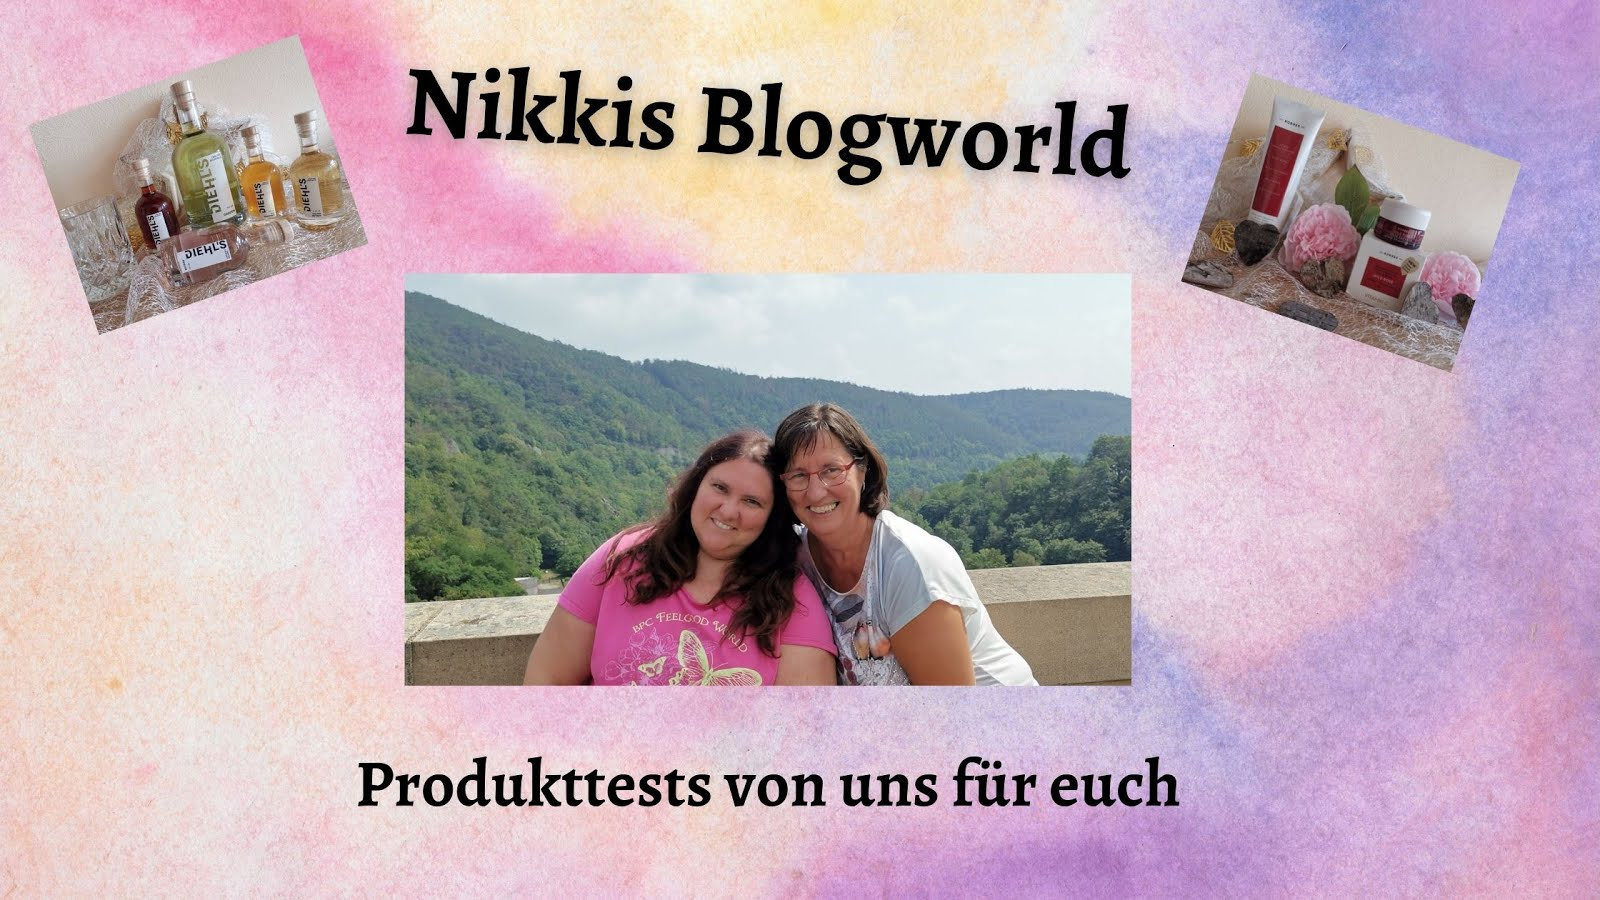 Nikkis Blogworld